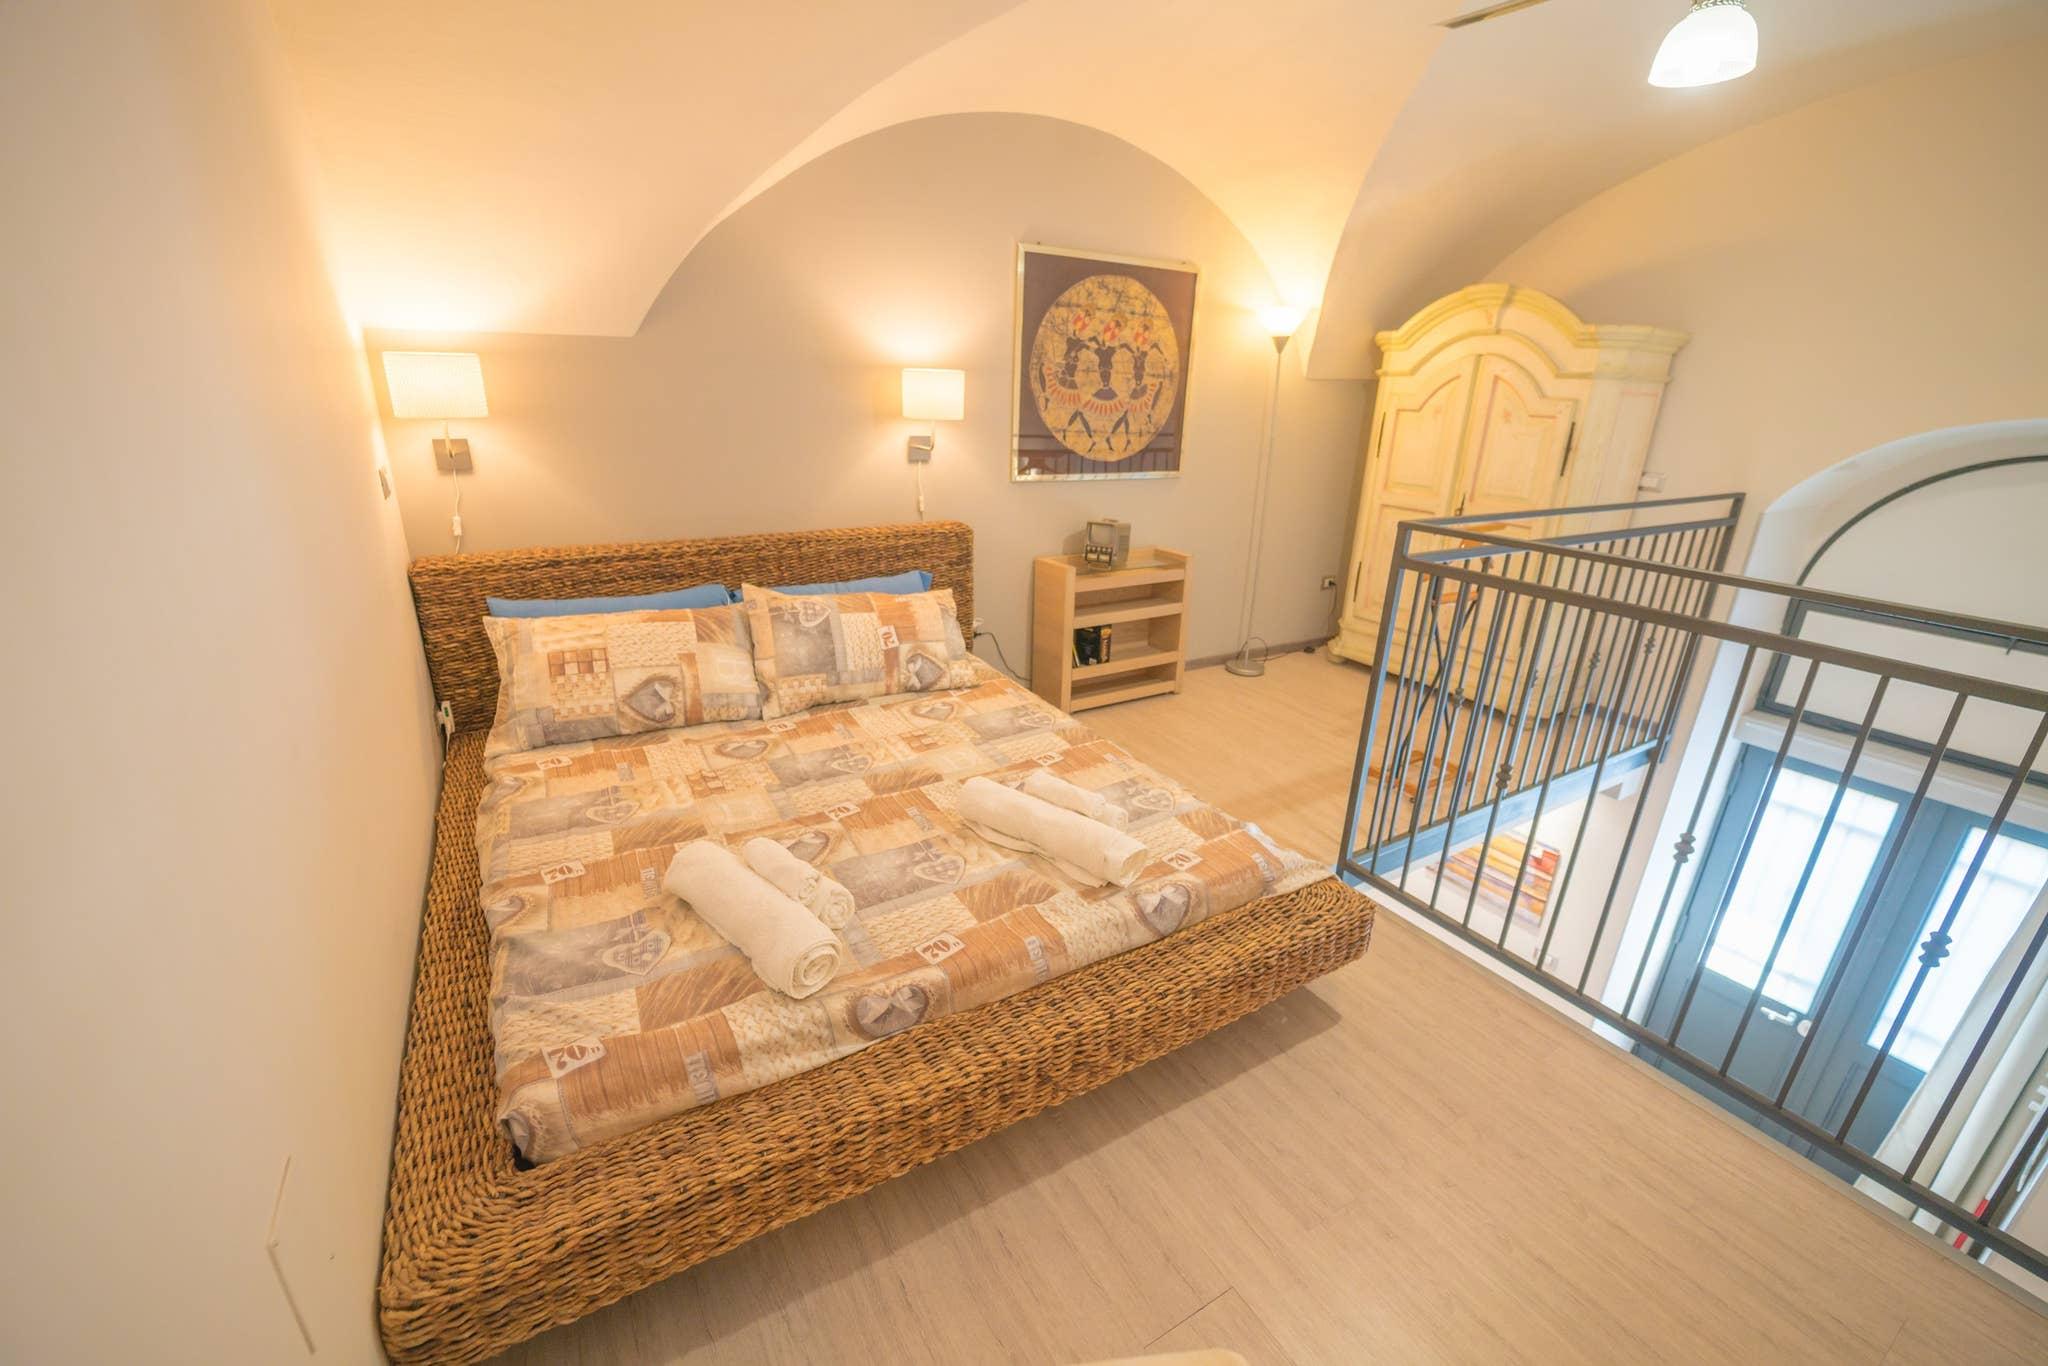 Maison de vacances  (2782175), Catania, Catania, Sicile, Italie, image 15